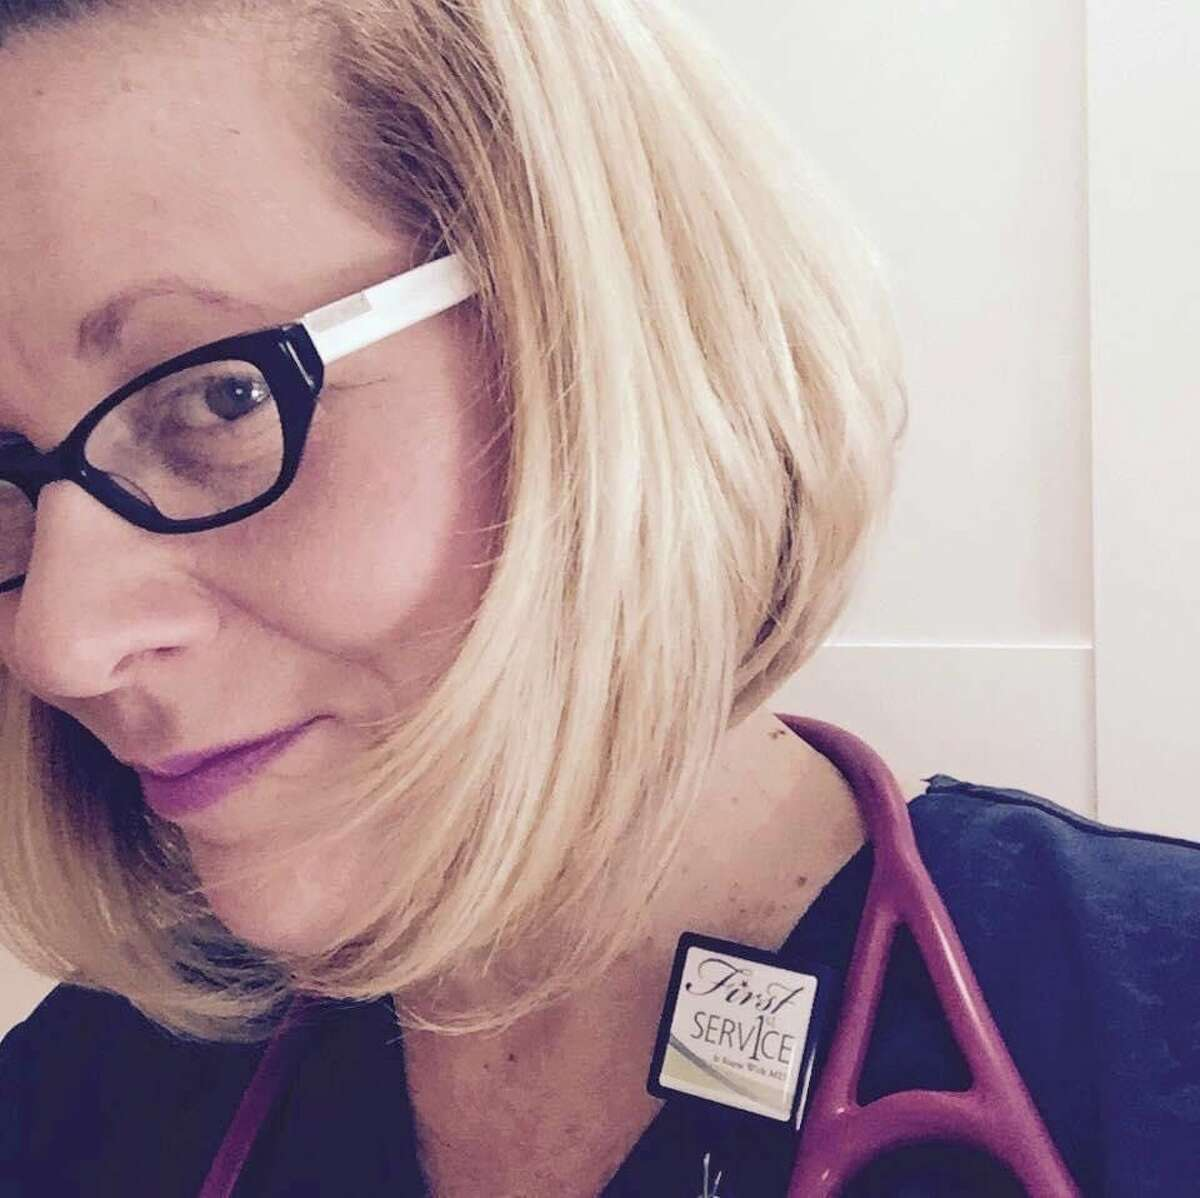 Despite following all of the precautions, Tuscola County Health Department Public Health Nurse Melissa Leggieri found herself hospitalized for the coronavirus. (Courtesy Photo)